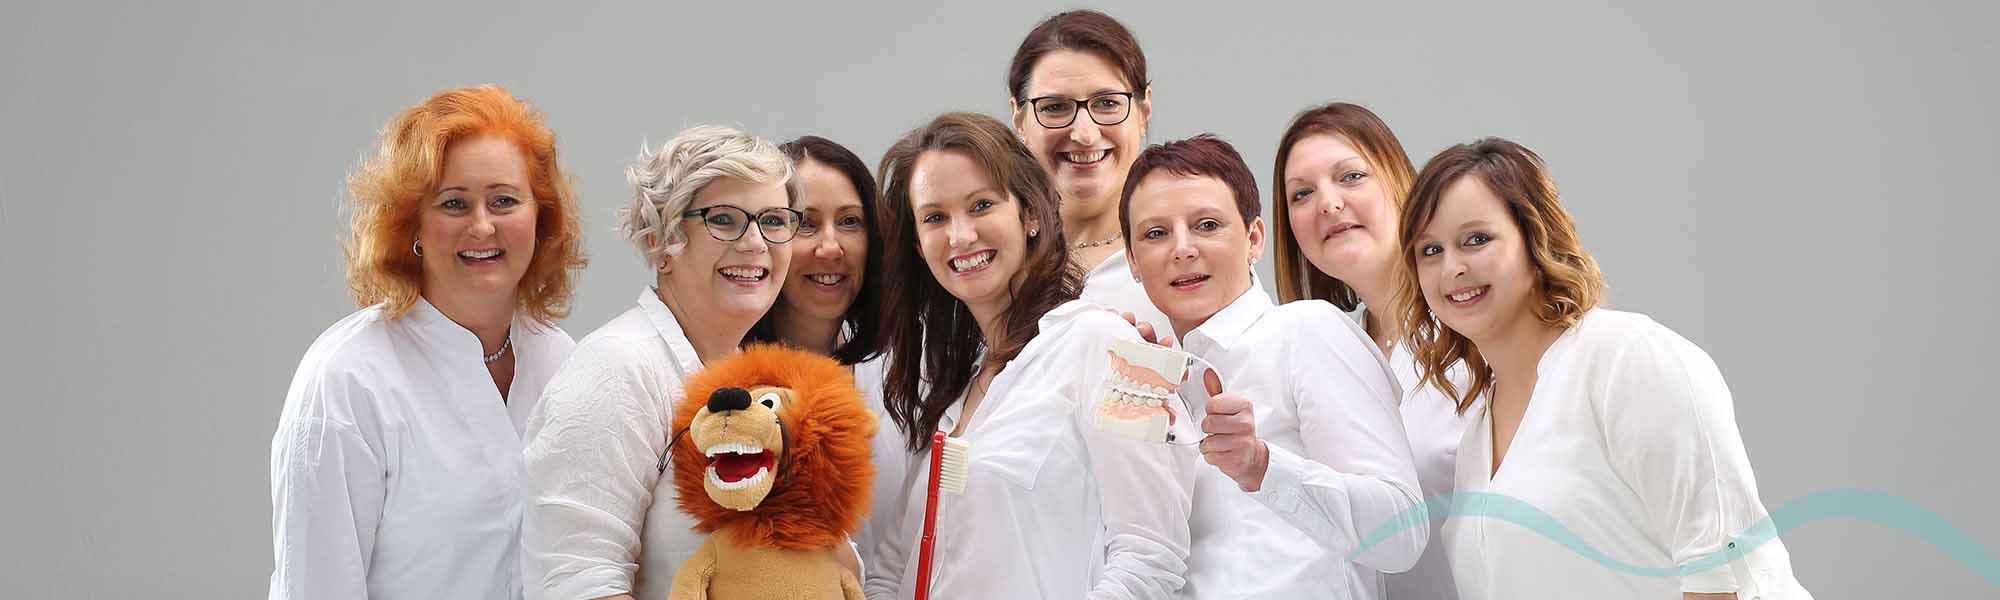 Prophylaxe für Kinder | Zahnarzt Dr  Holler & Kollegen Arzberg